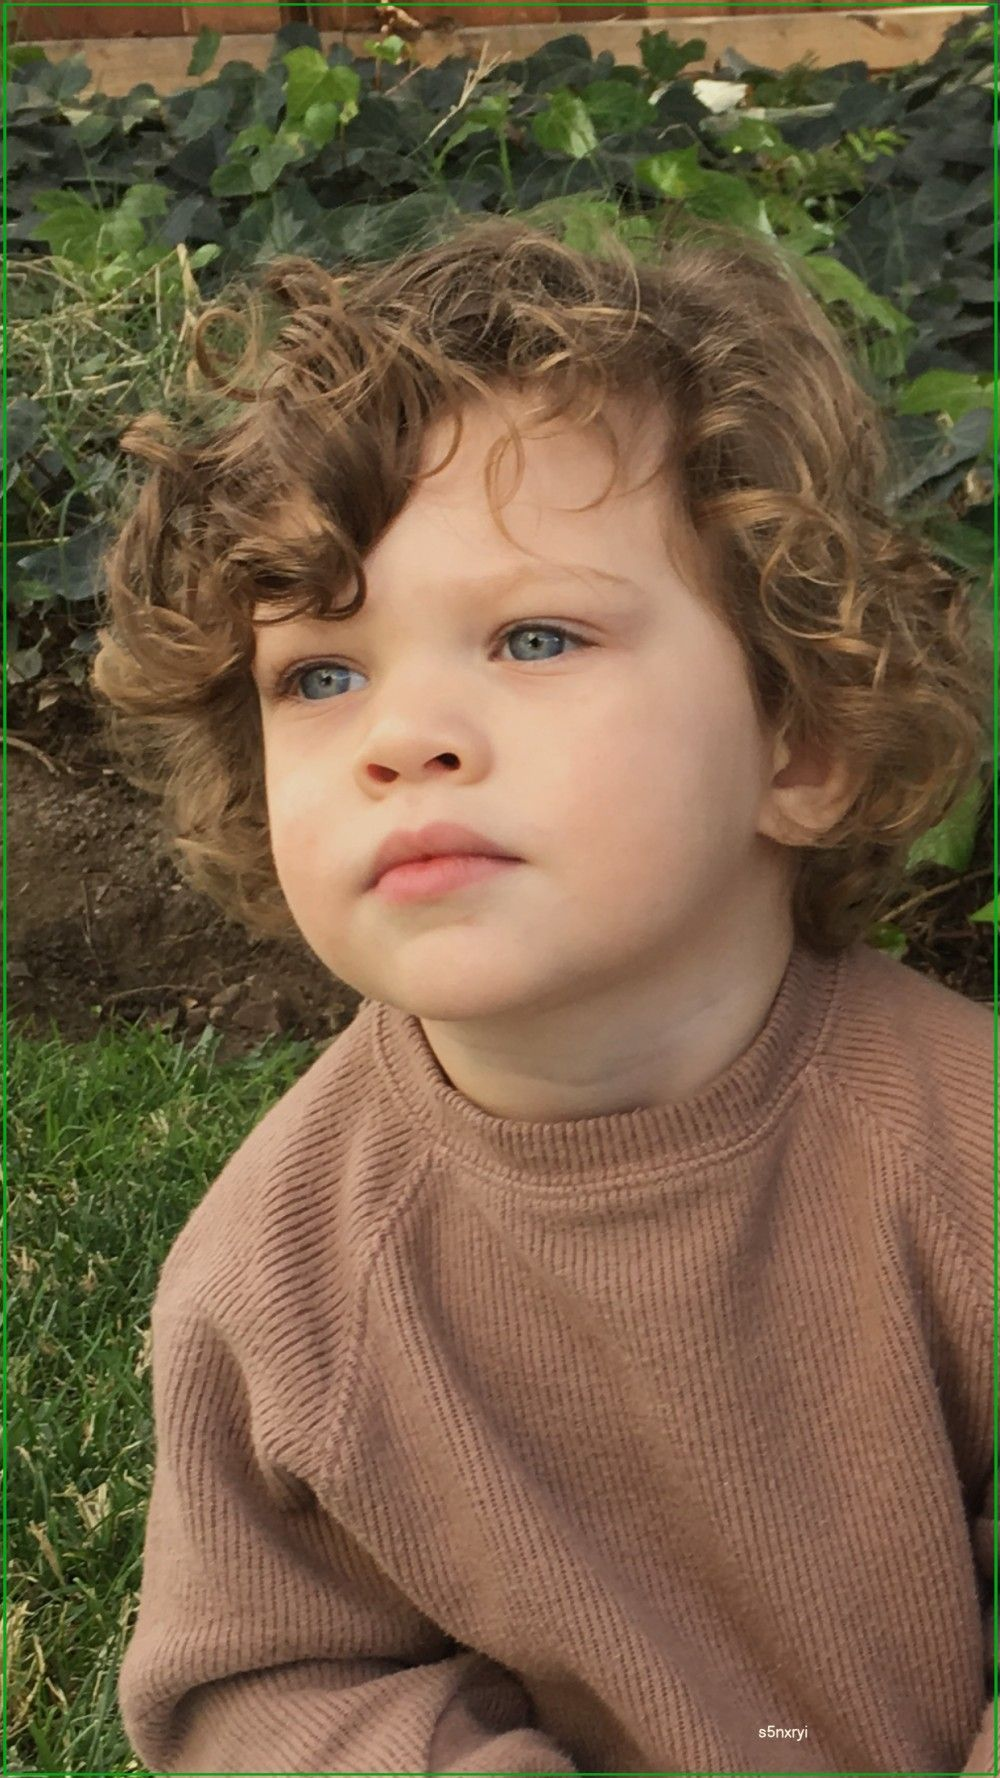 Lennox Curly Hair Baby Boy Curly Hair Baby Toddler Curly Hair